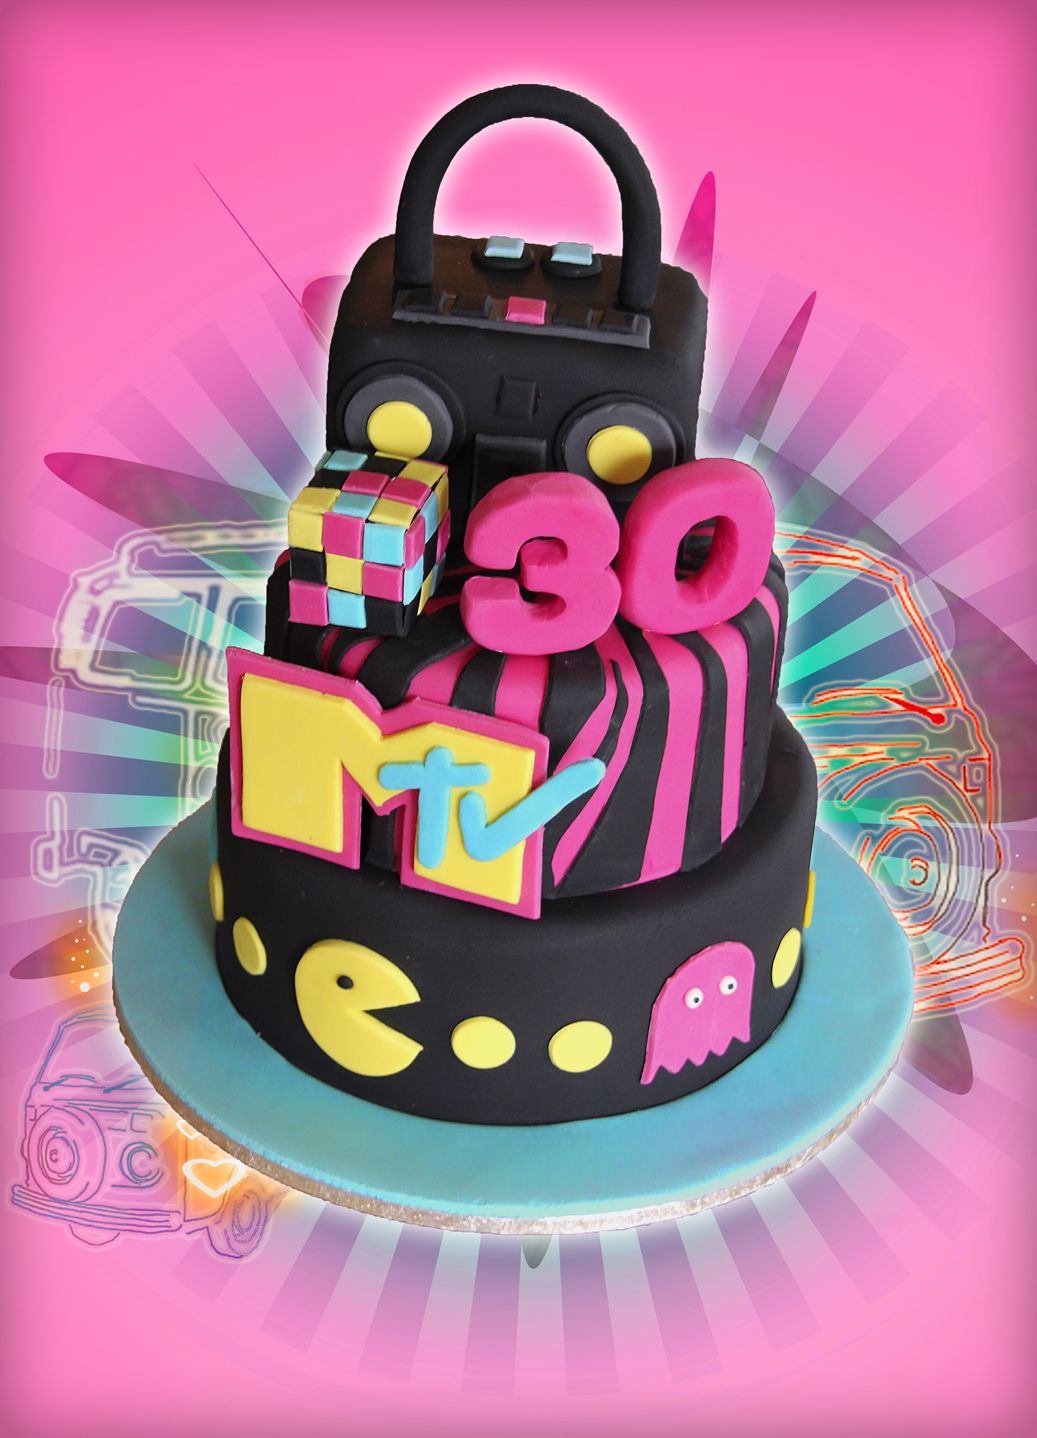 80s theme cake 13th birthday party pinterest torten. Black Bedroom Furniture Sets. Home Design Ideas